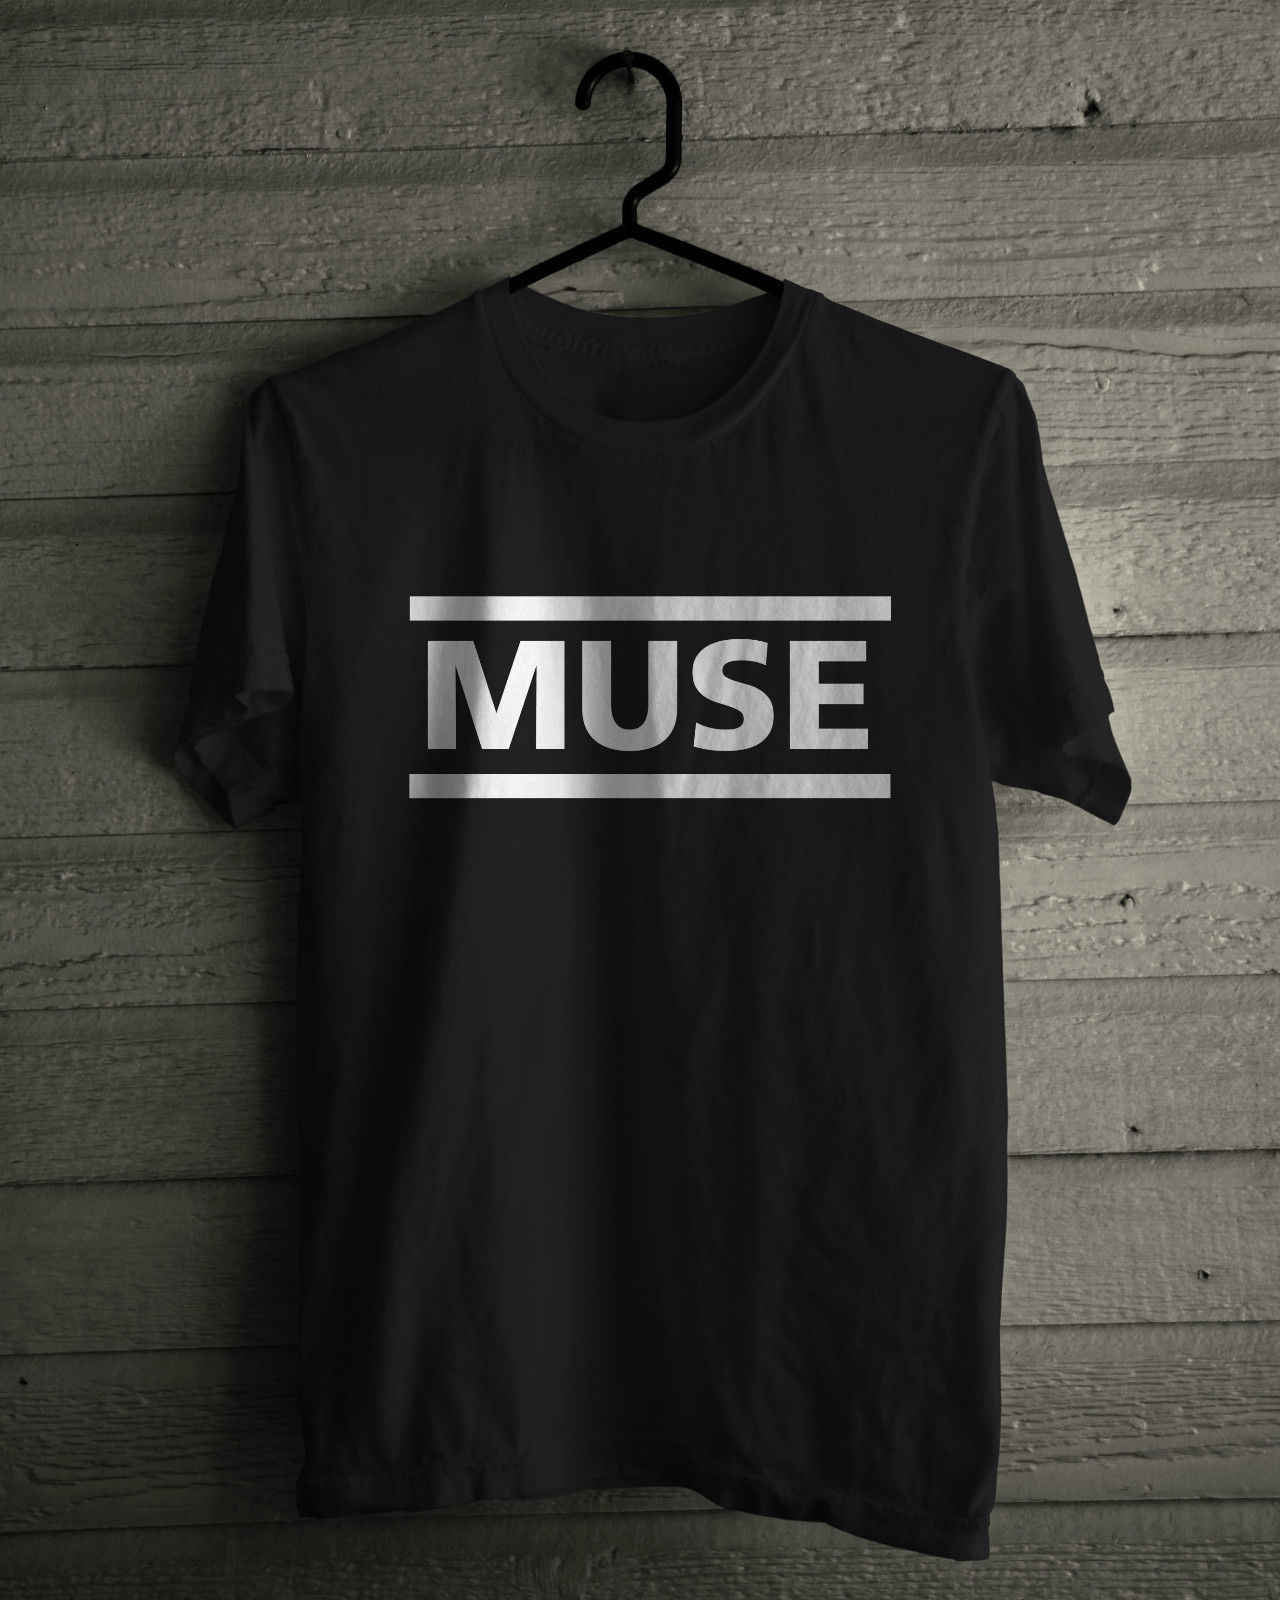 muse logo model:4 BLACK t-shirt MUSE BAND kids clothing boy girl children shirt